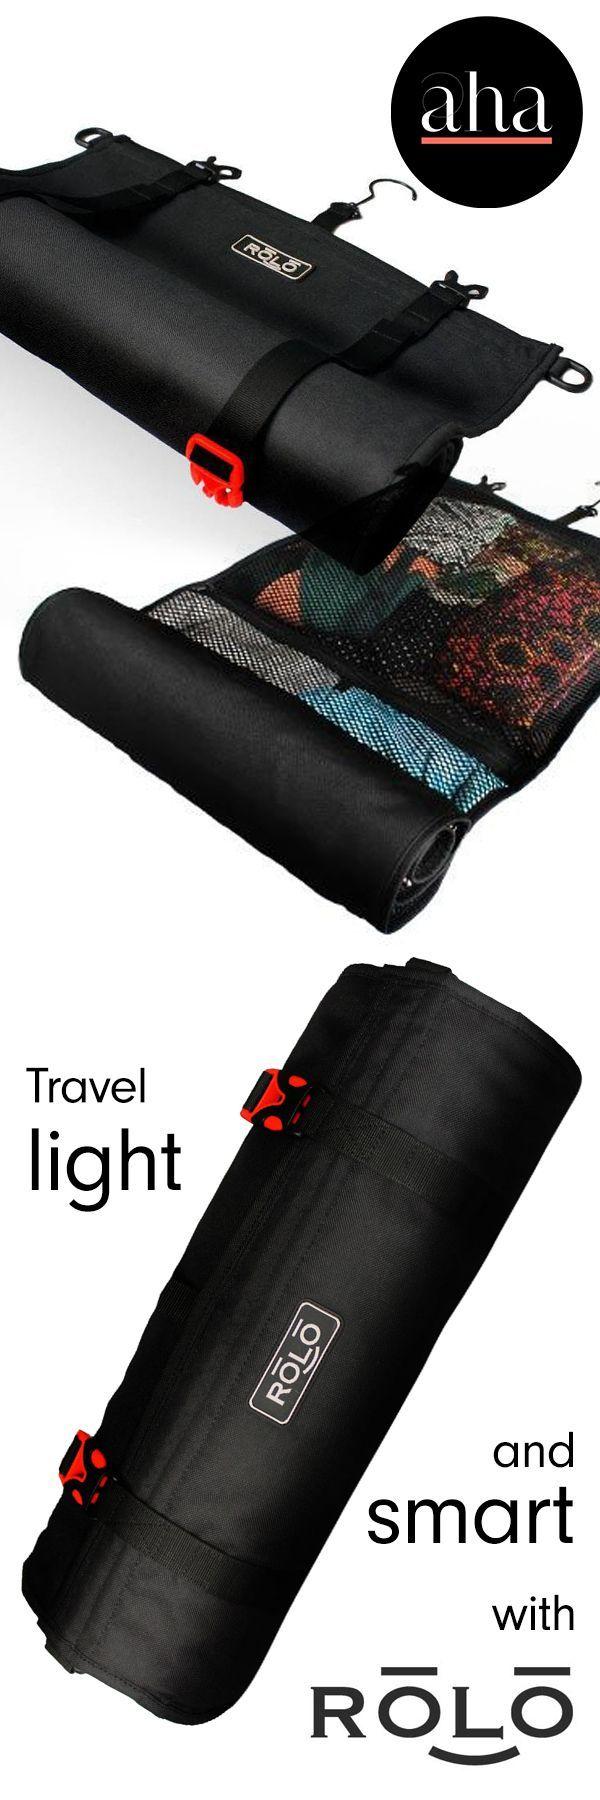 Rolo Multi Purpose Travel Bag Travel Bags Travel